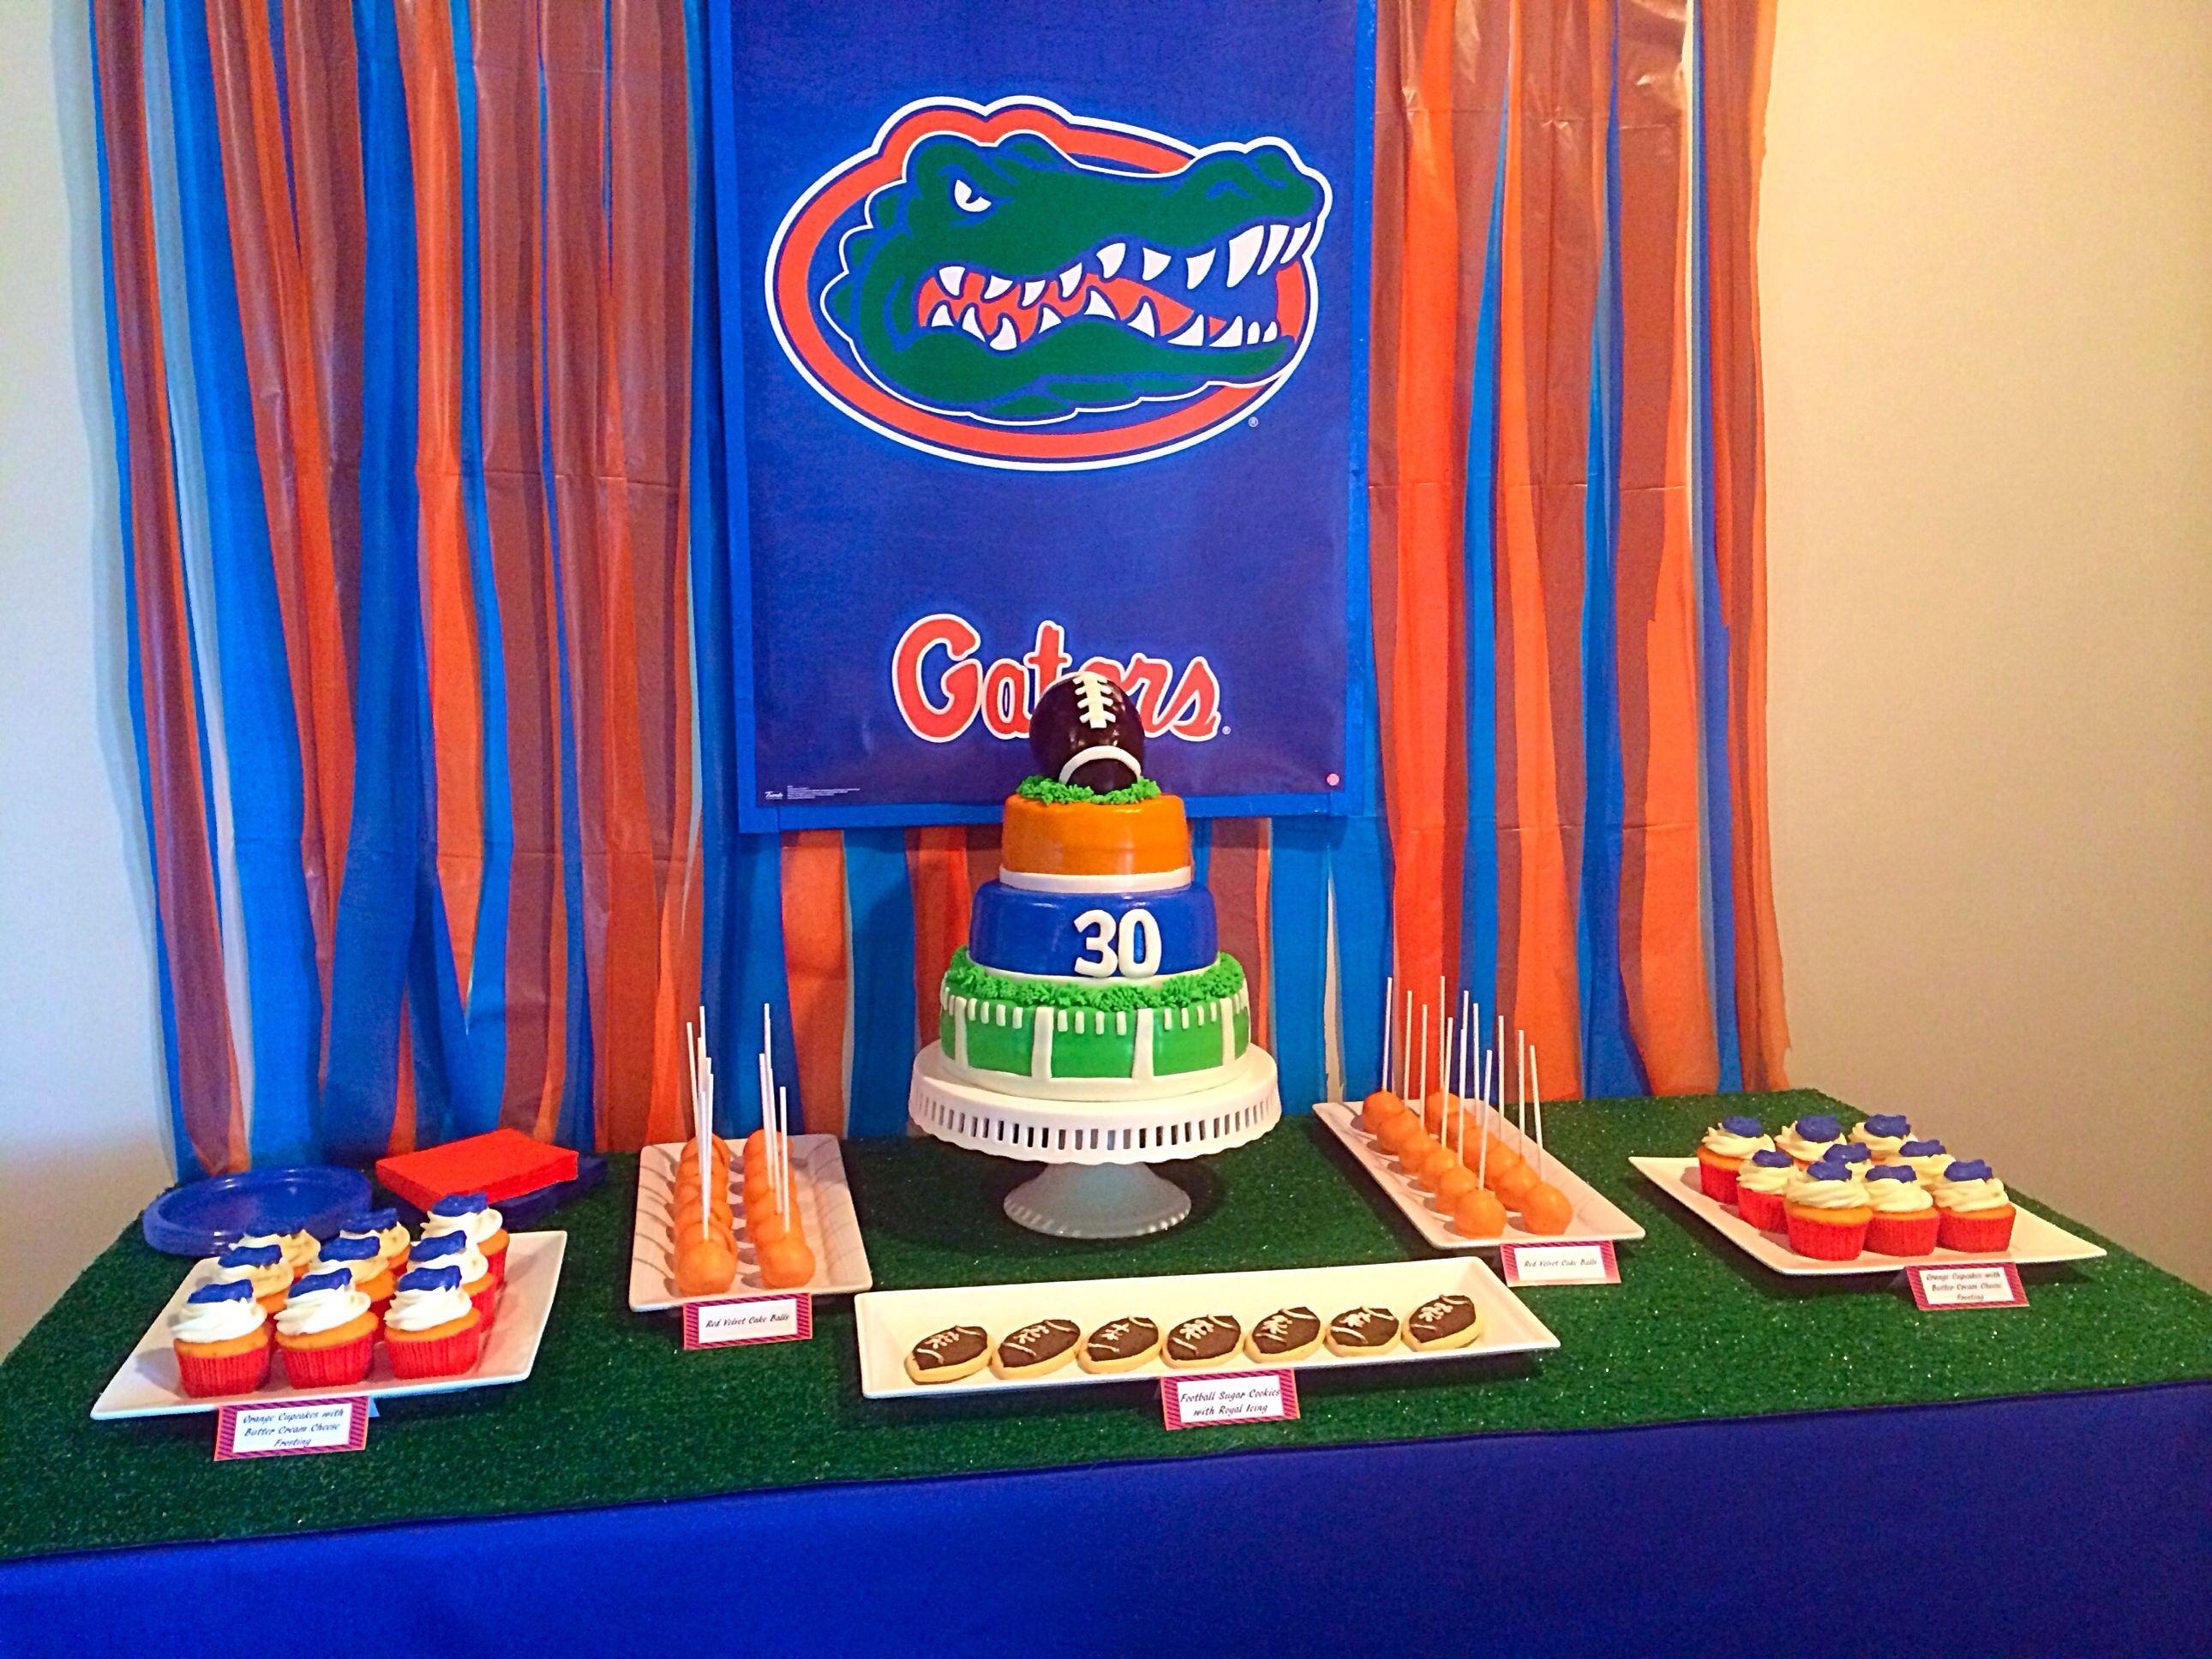 Best 25+ Florida gators football ideas on Pinterest | Fl gators ...